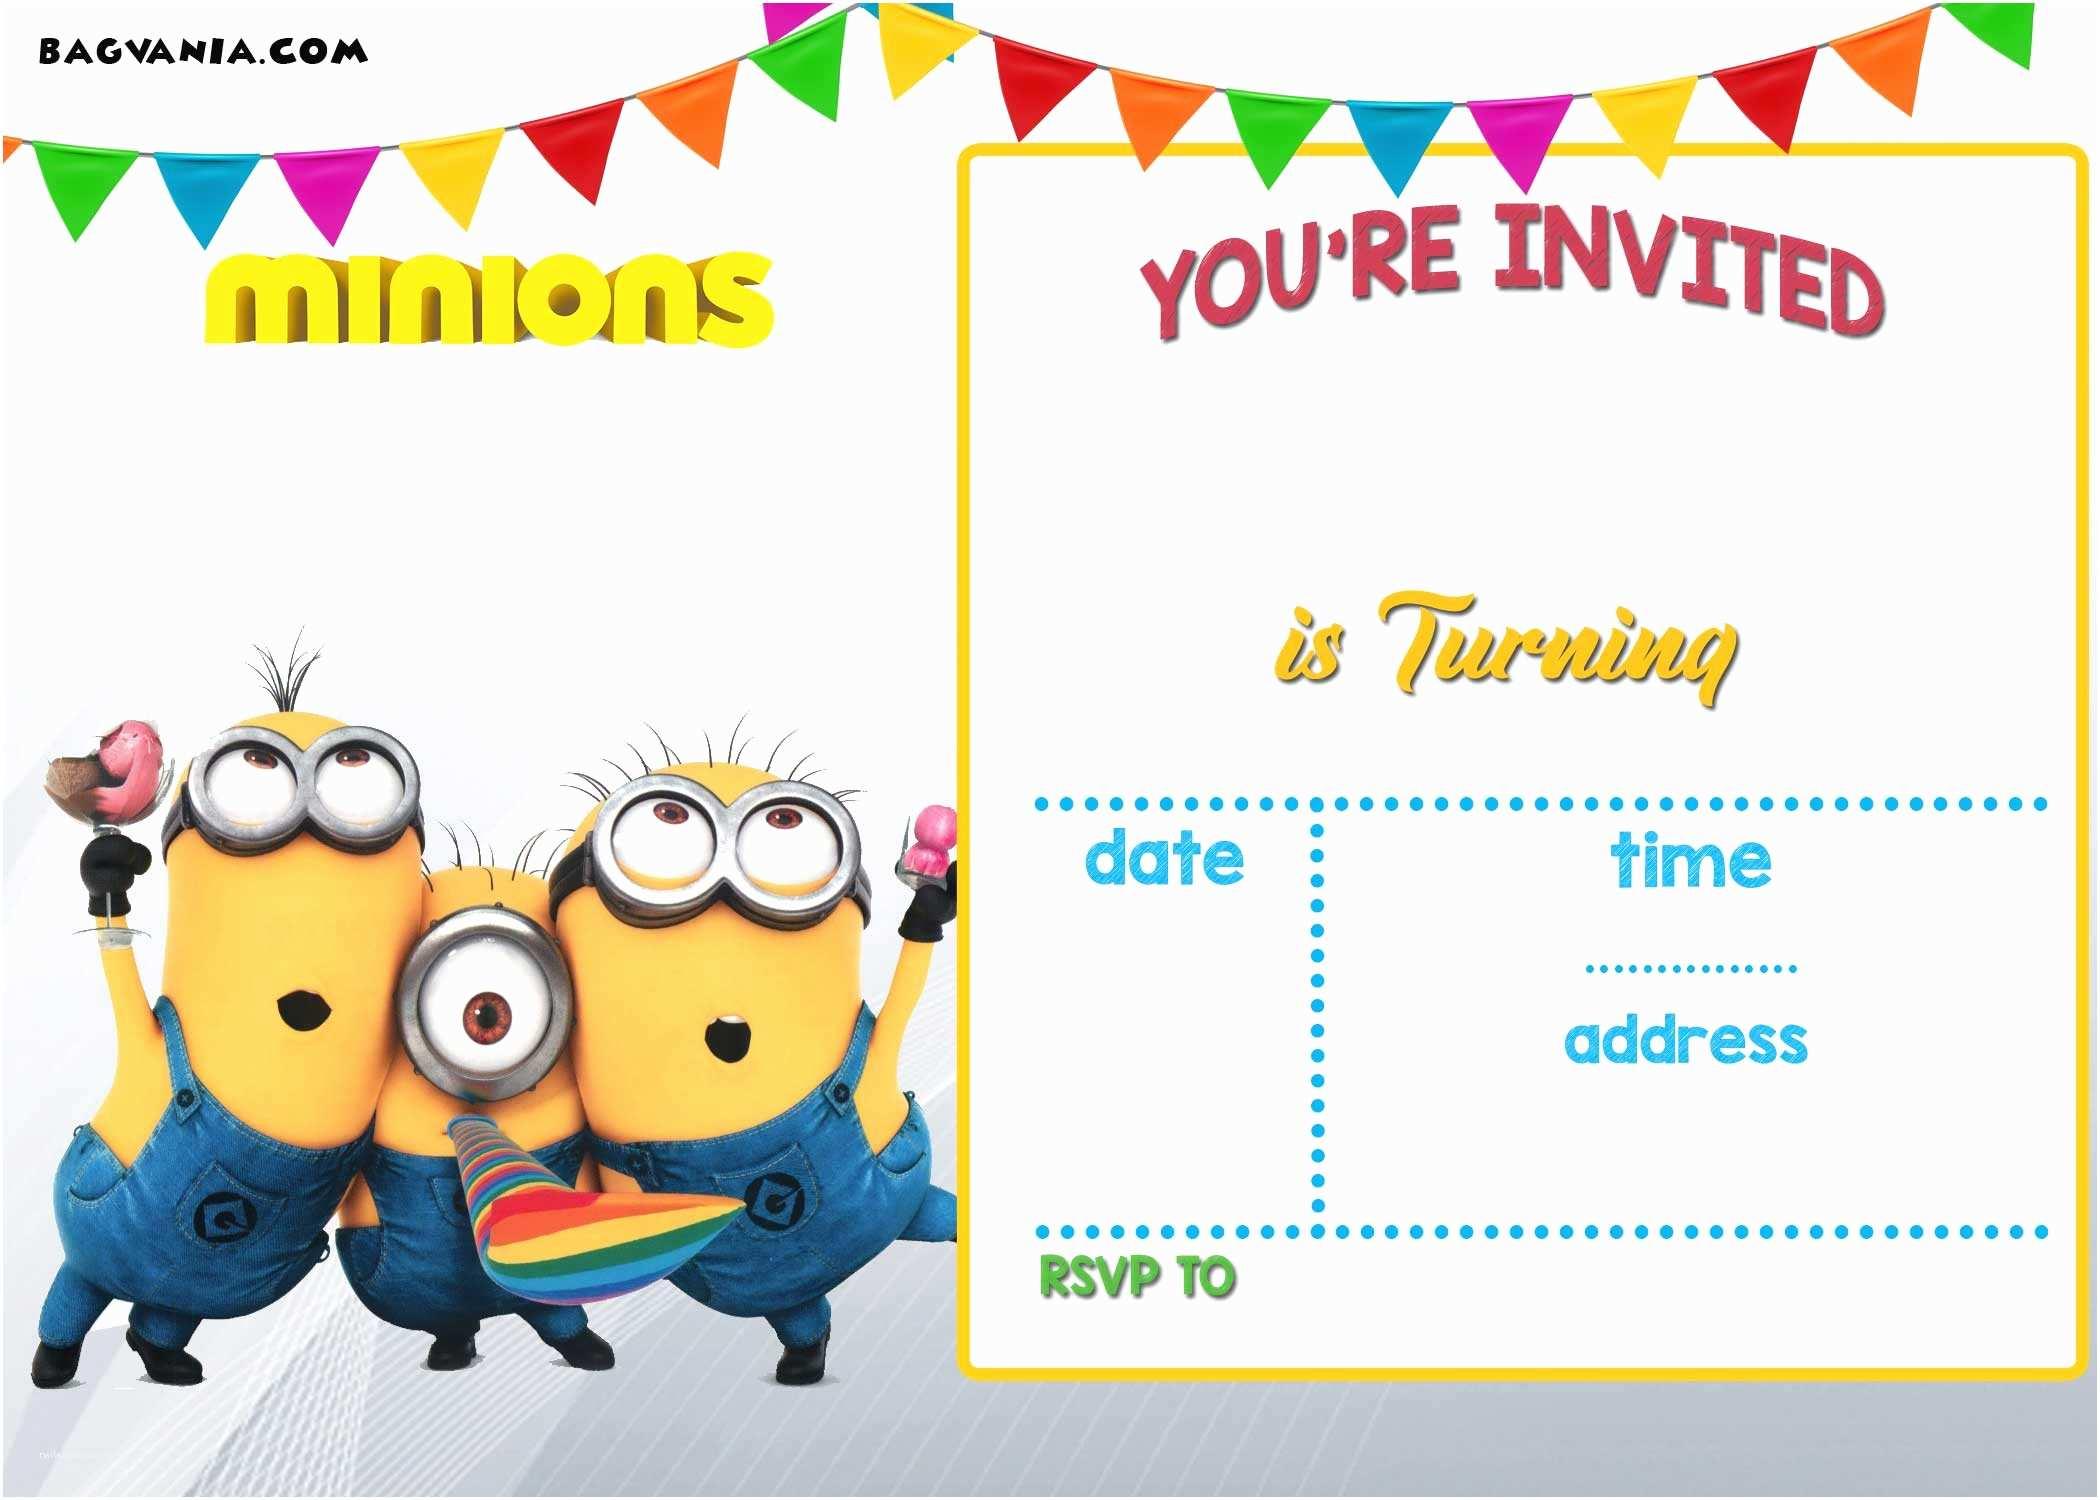 Free Party Invitations Free Printable Minion Birthday Invitation Templates